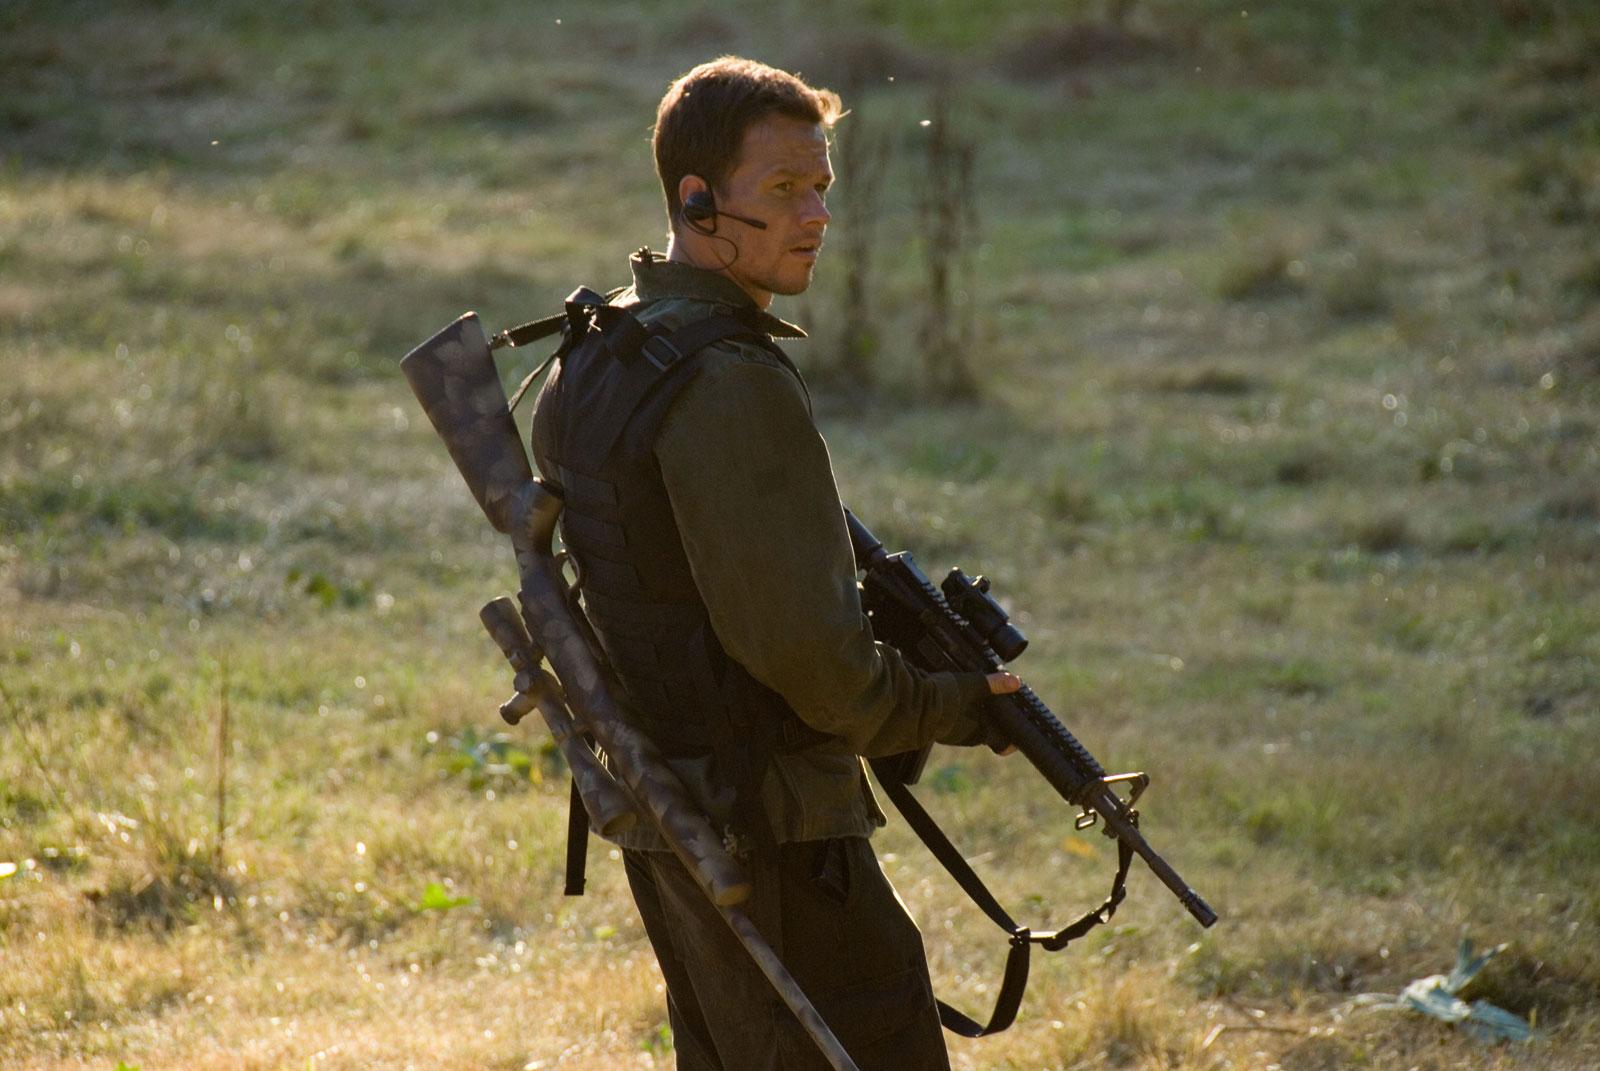 Снайпер 2 смотреть онлайн, Снайперсмотреть онлайн бесплатно в HD 14 фотография